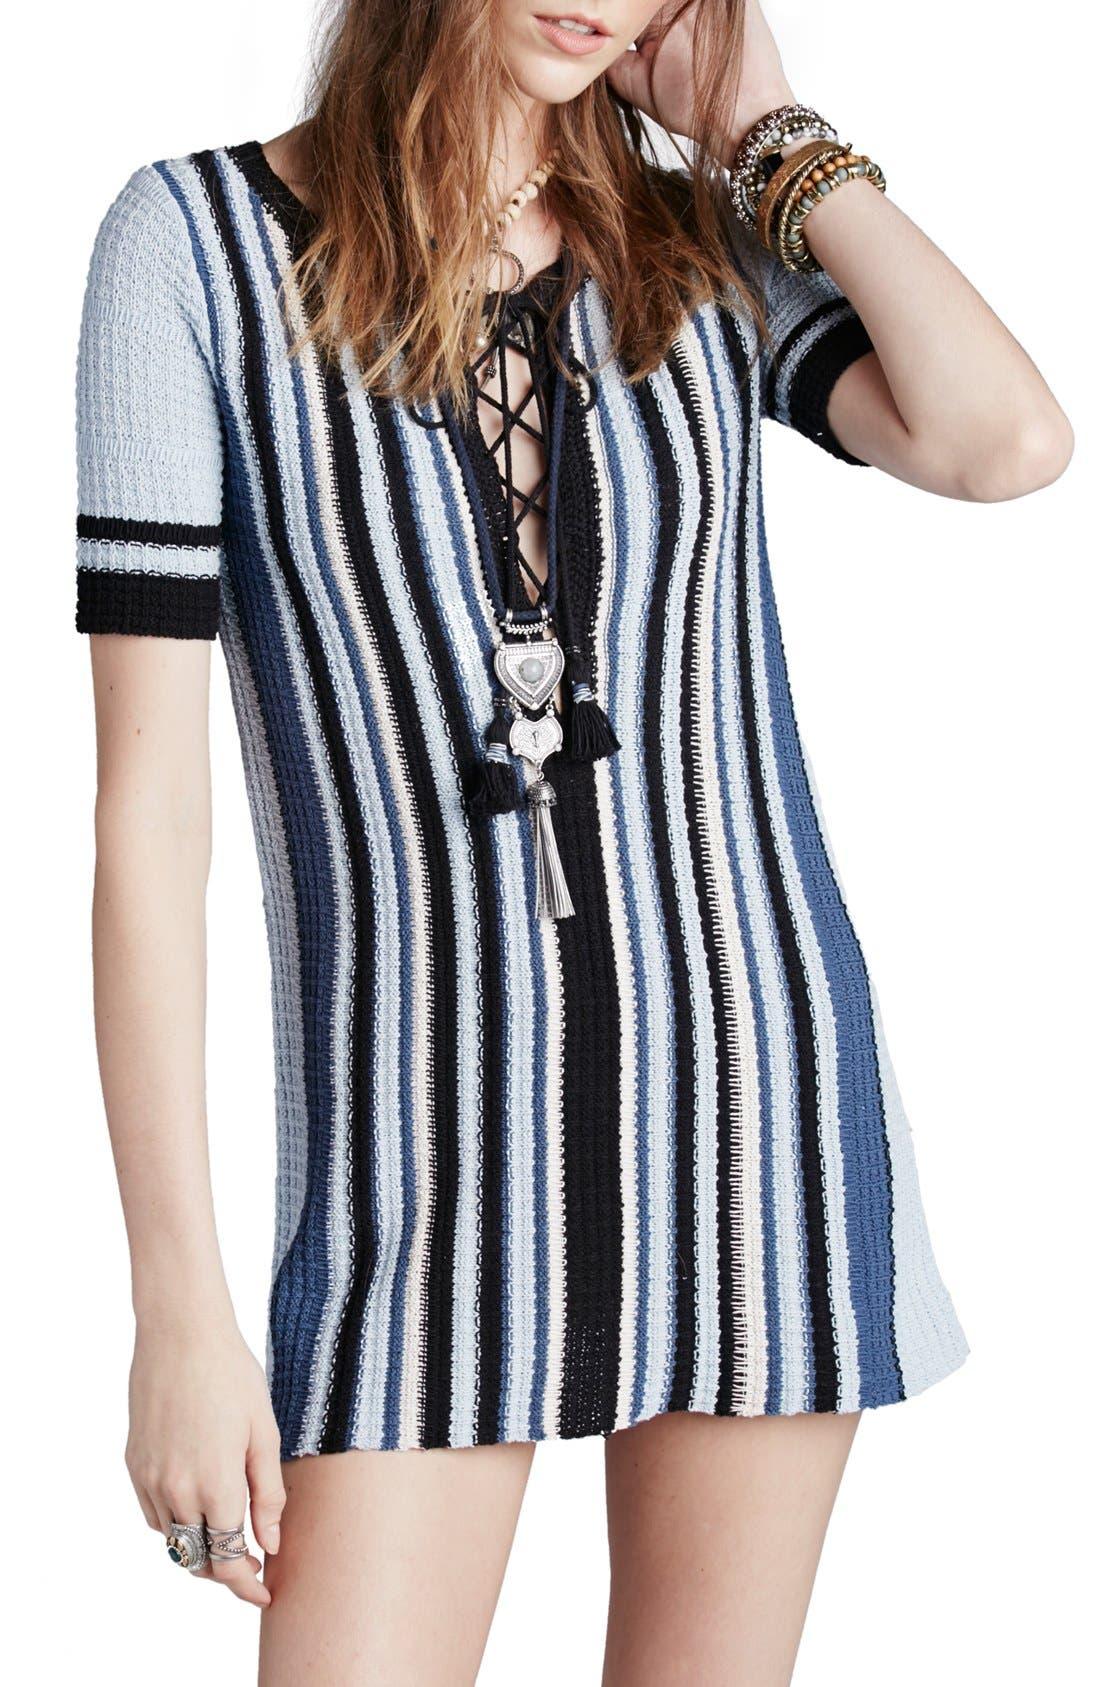 Alternate Image 1 Selected - Free People 'Lollipop' Cotton Sweater Dress